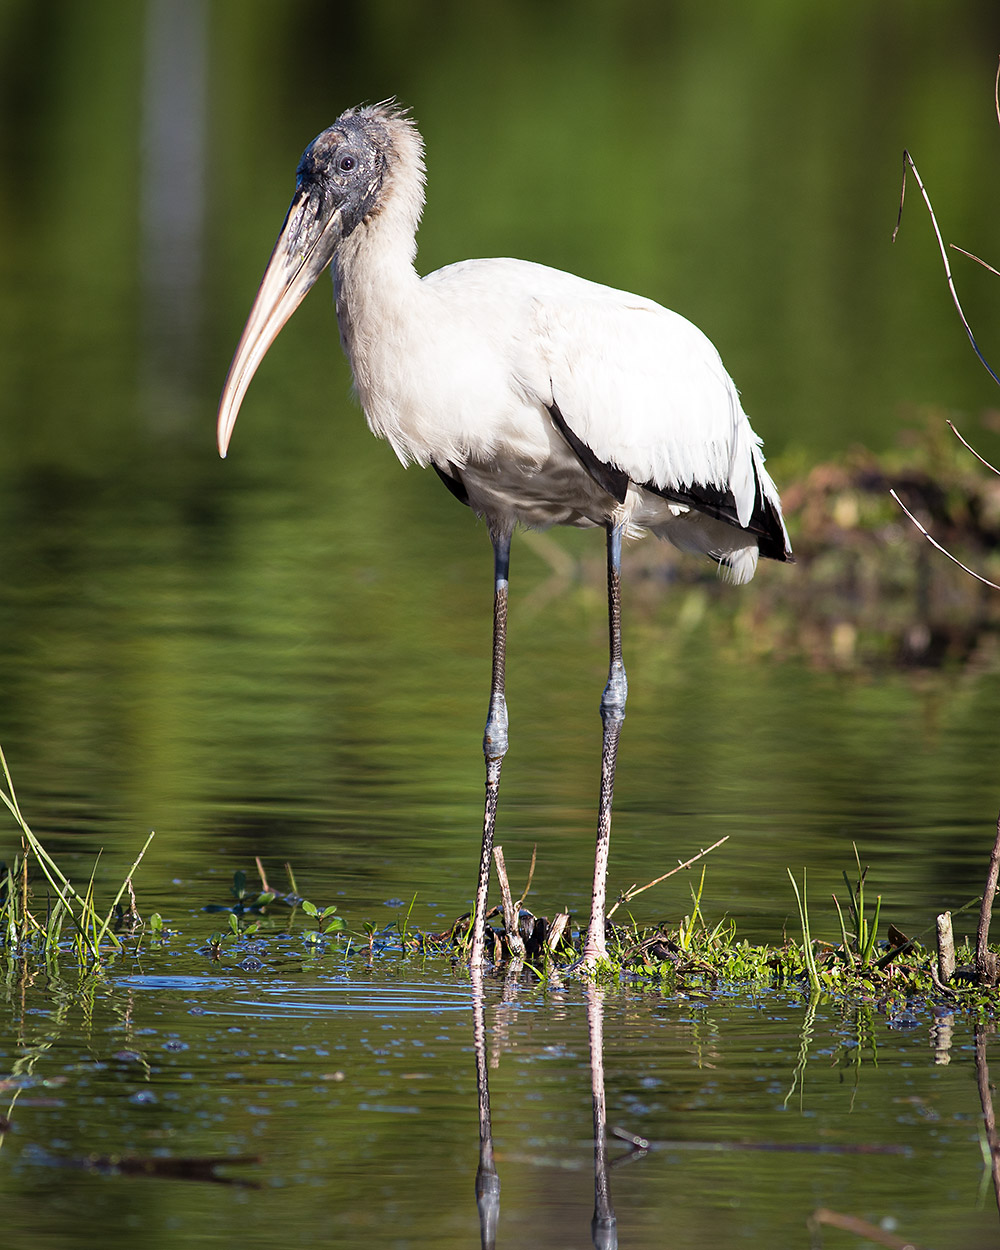 Juvenile Stork